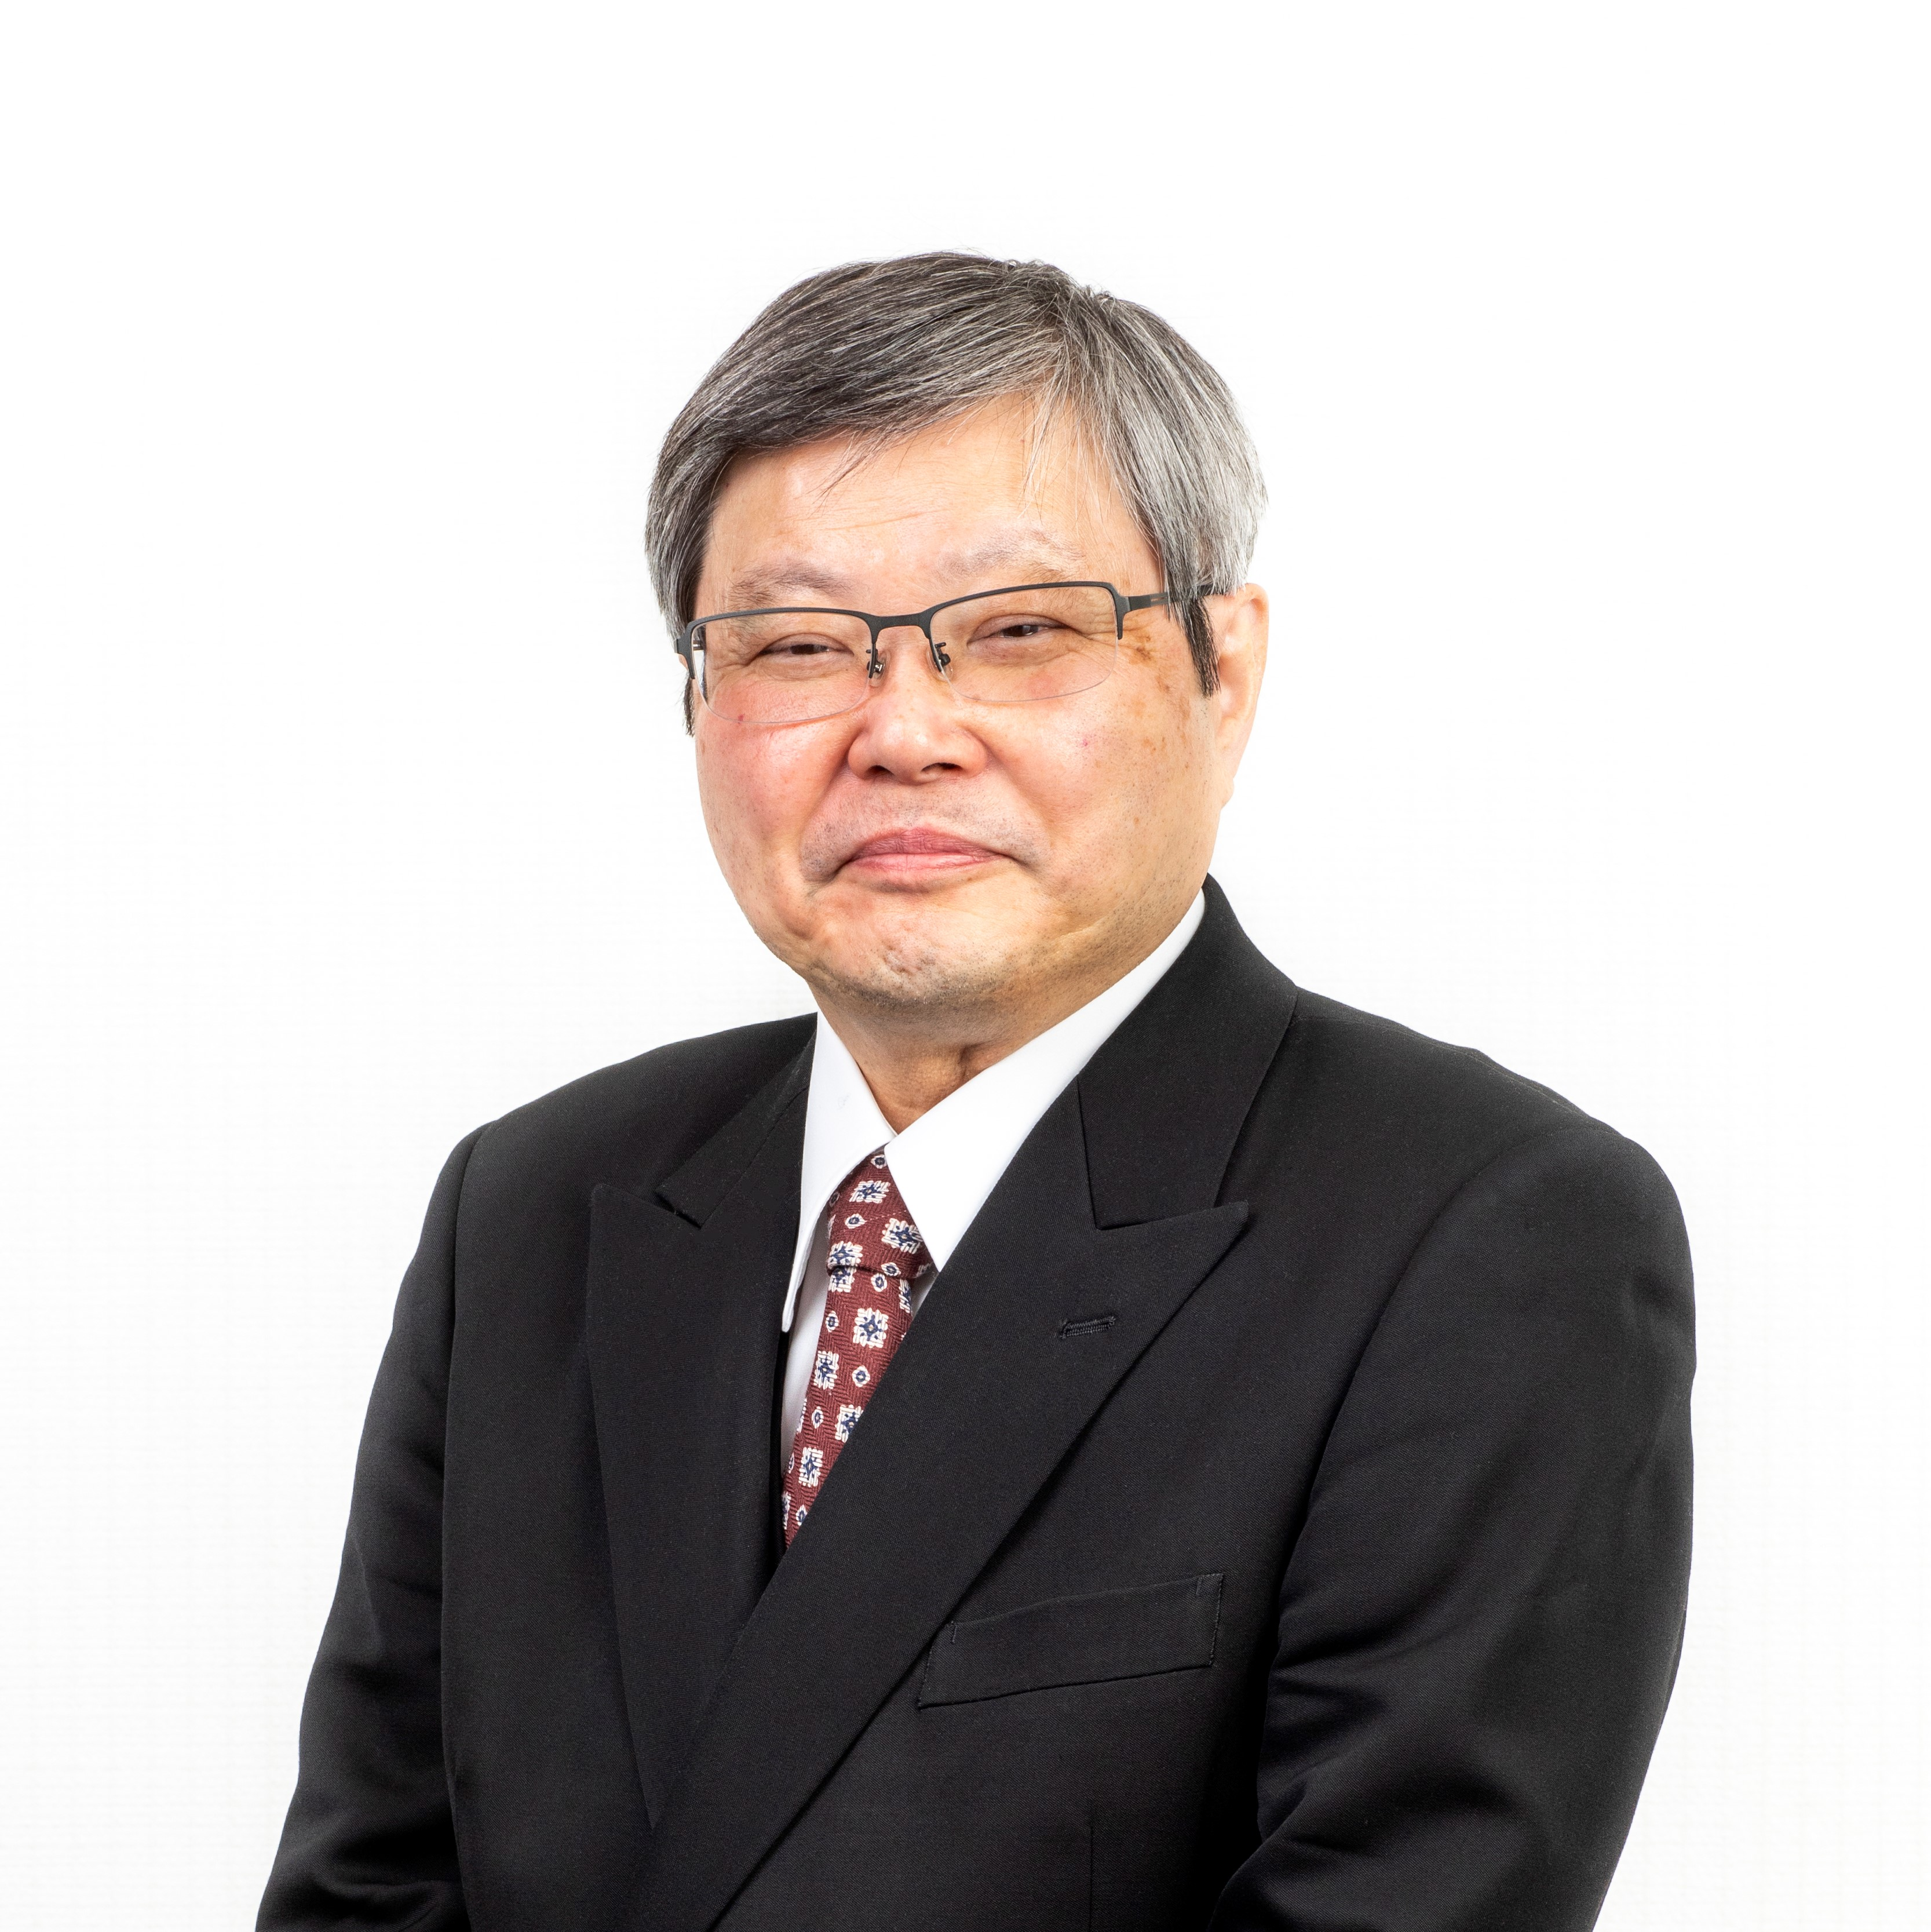 Masayuki Harimoto